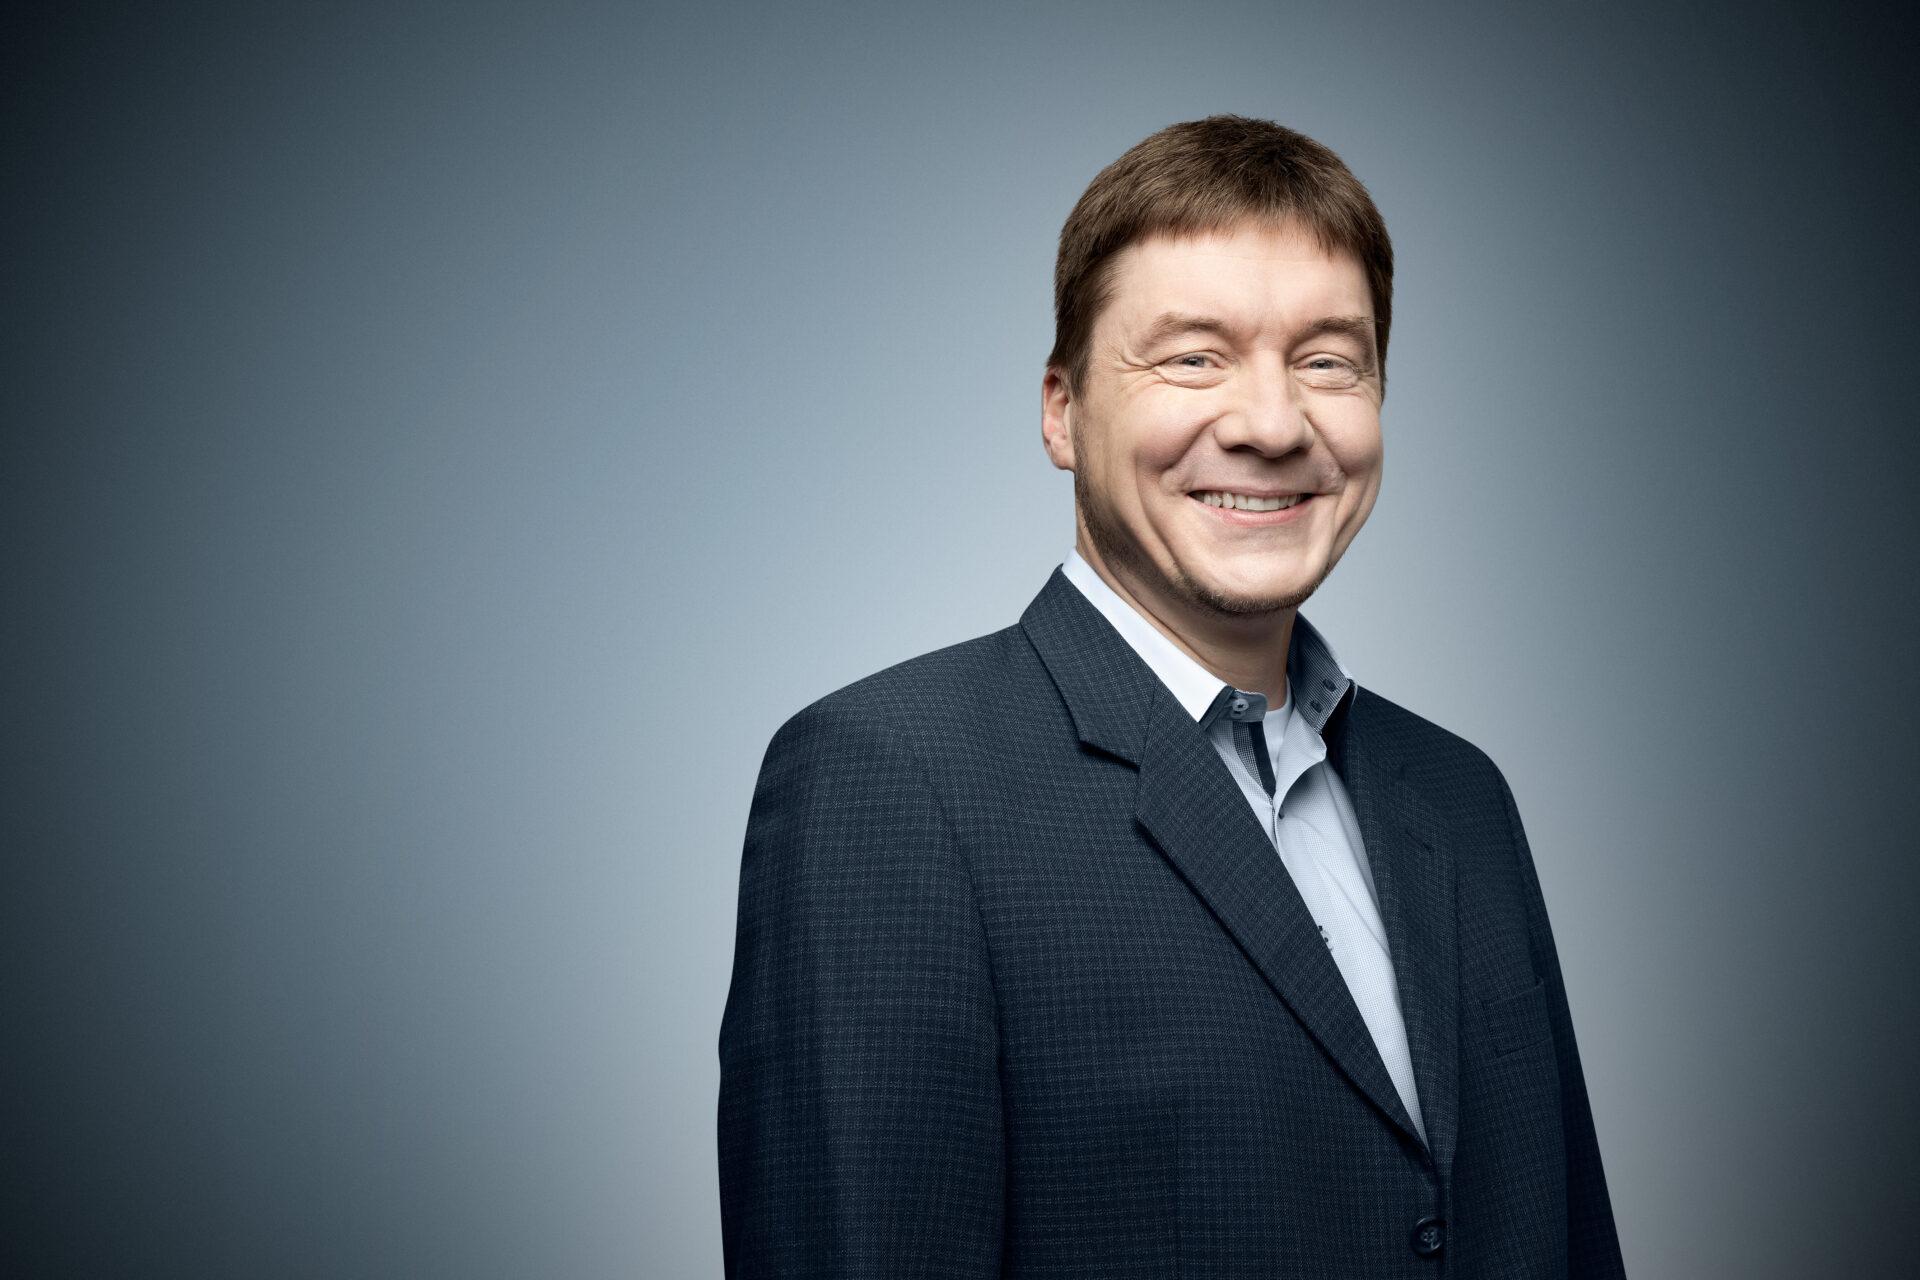 Thorsten Borges Dr Gemmeke GmbH Business Portrait Jerome Courtois Photography 700x467 1